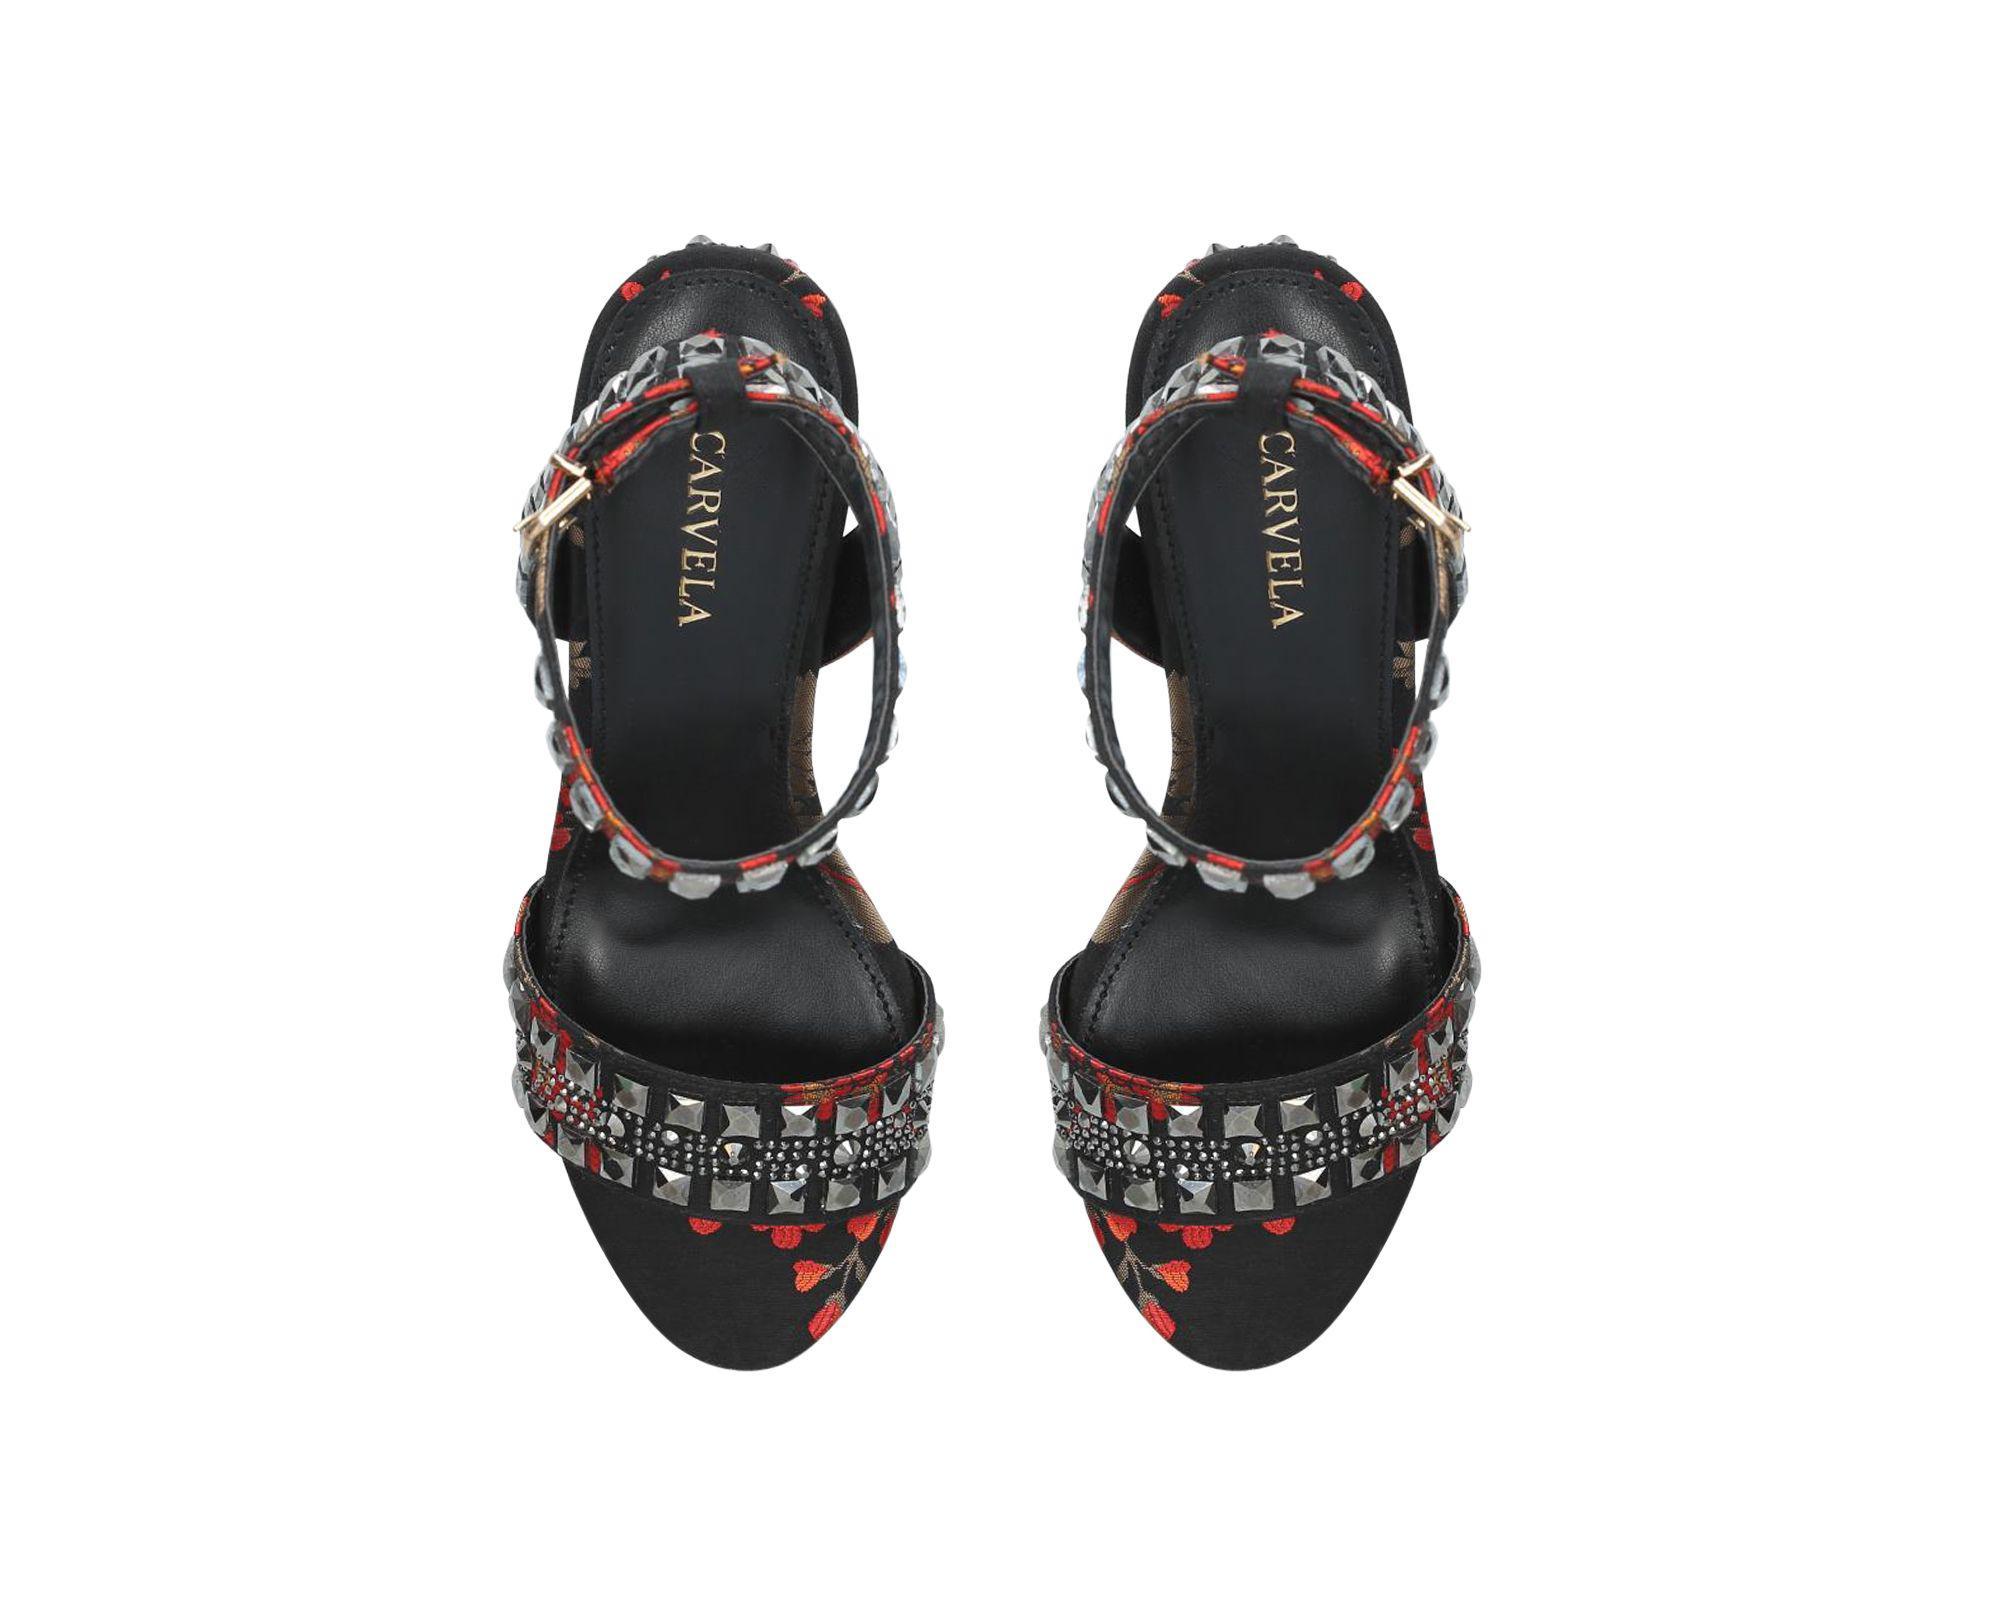 52826564f23 Carvela Kurt Geiger - Multicolor Red  gill  Mid Heel Sandals - Lyst. View  fullscreen